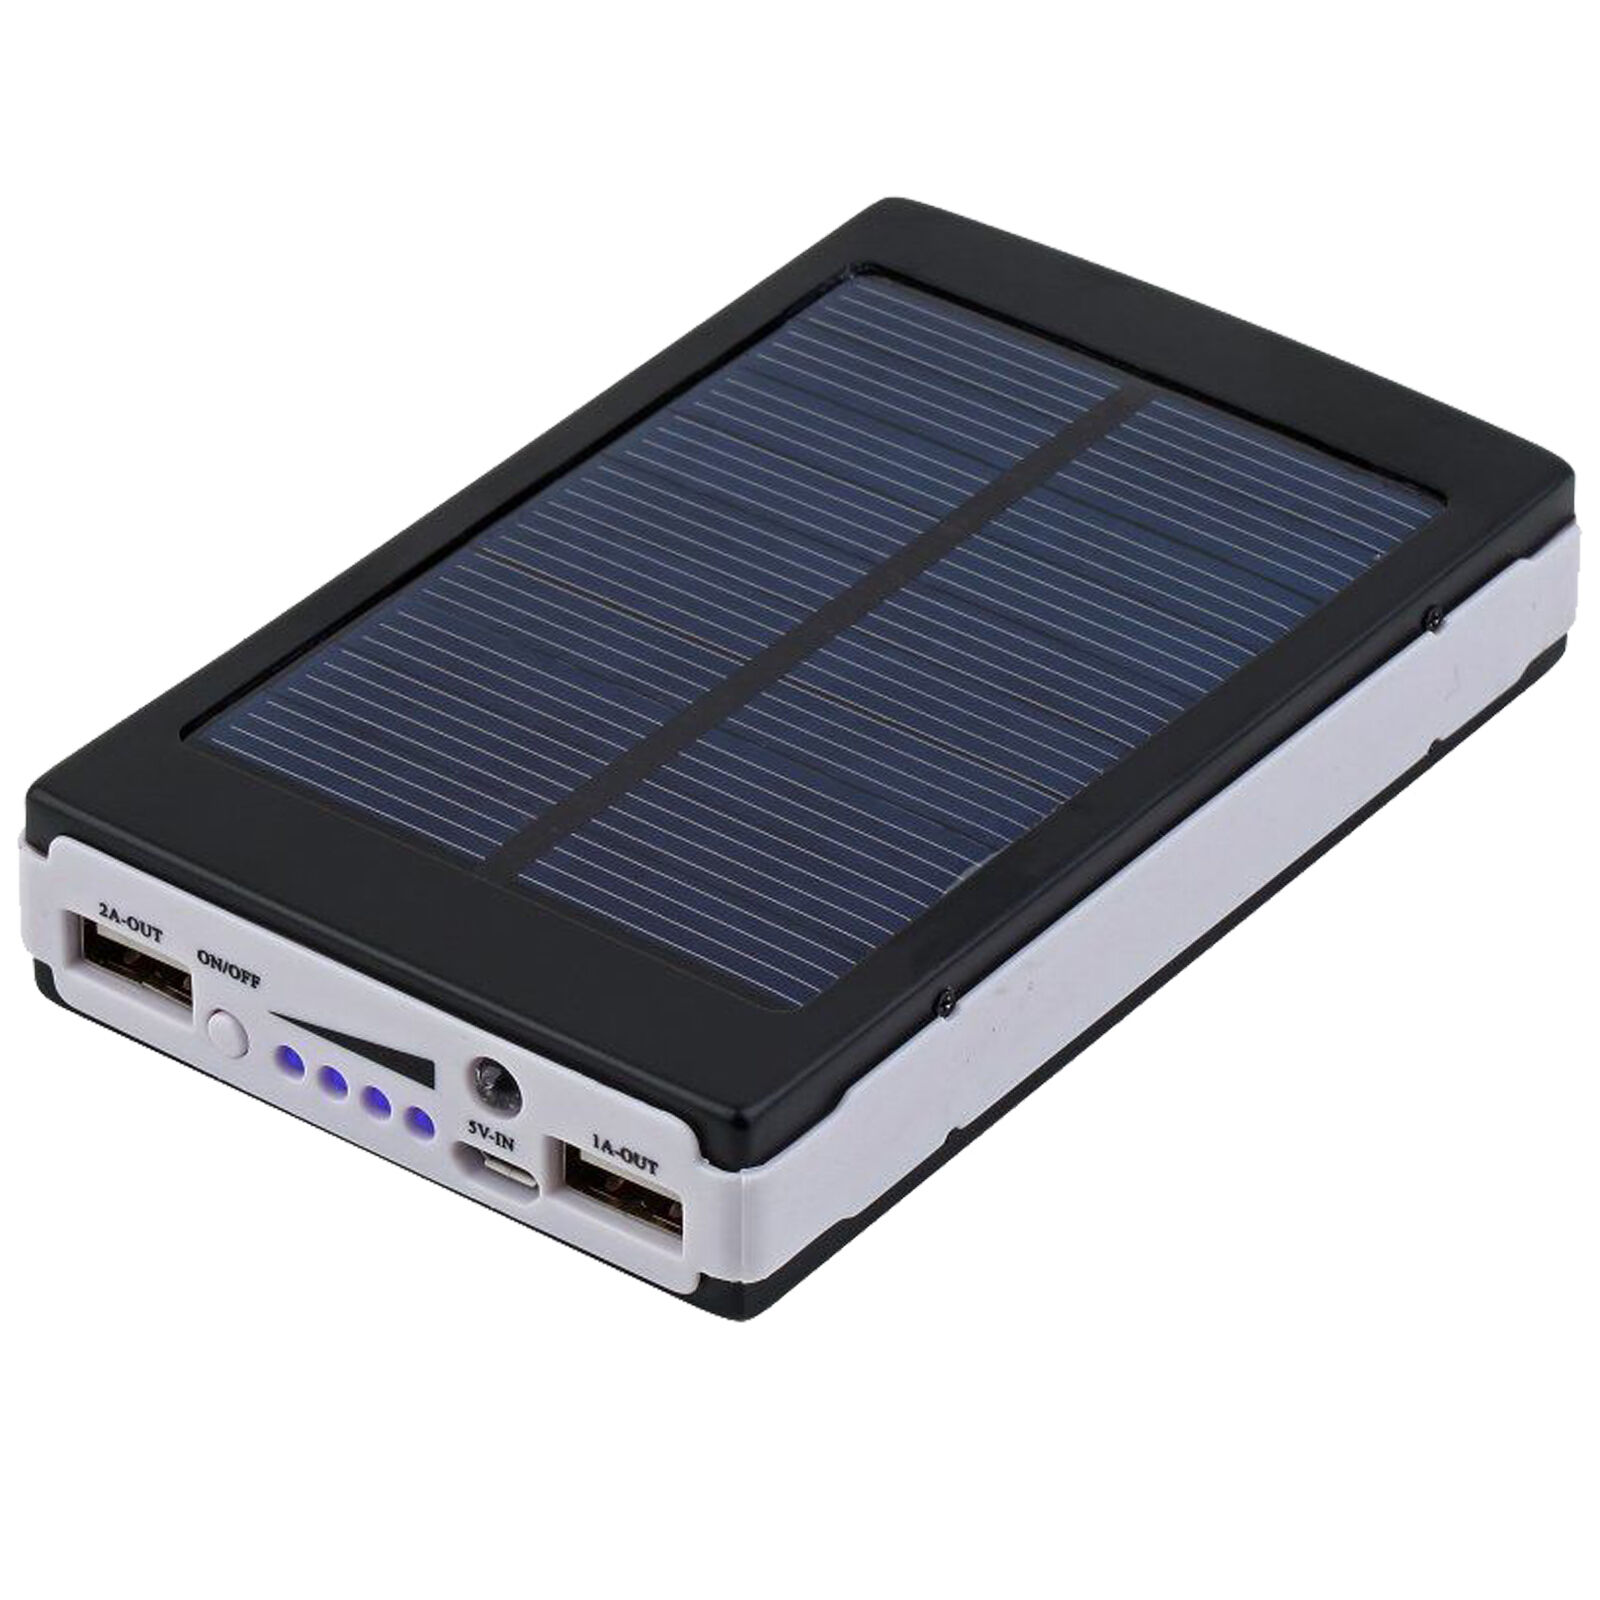 Black 80000mAh Dual USB Portable Solar Battery Charger Power